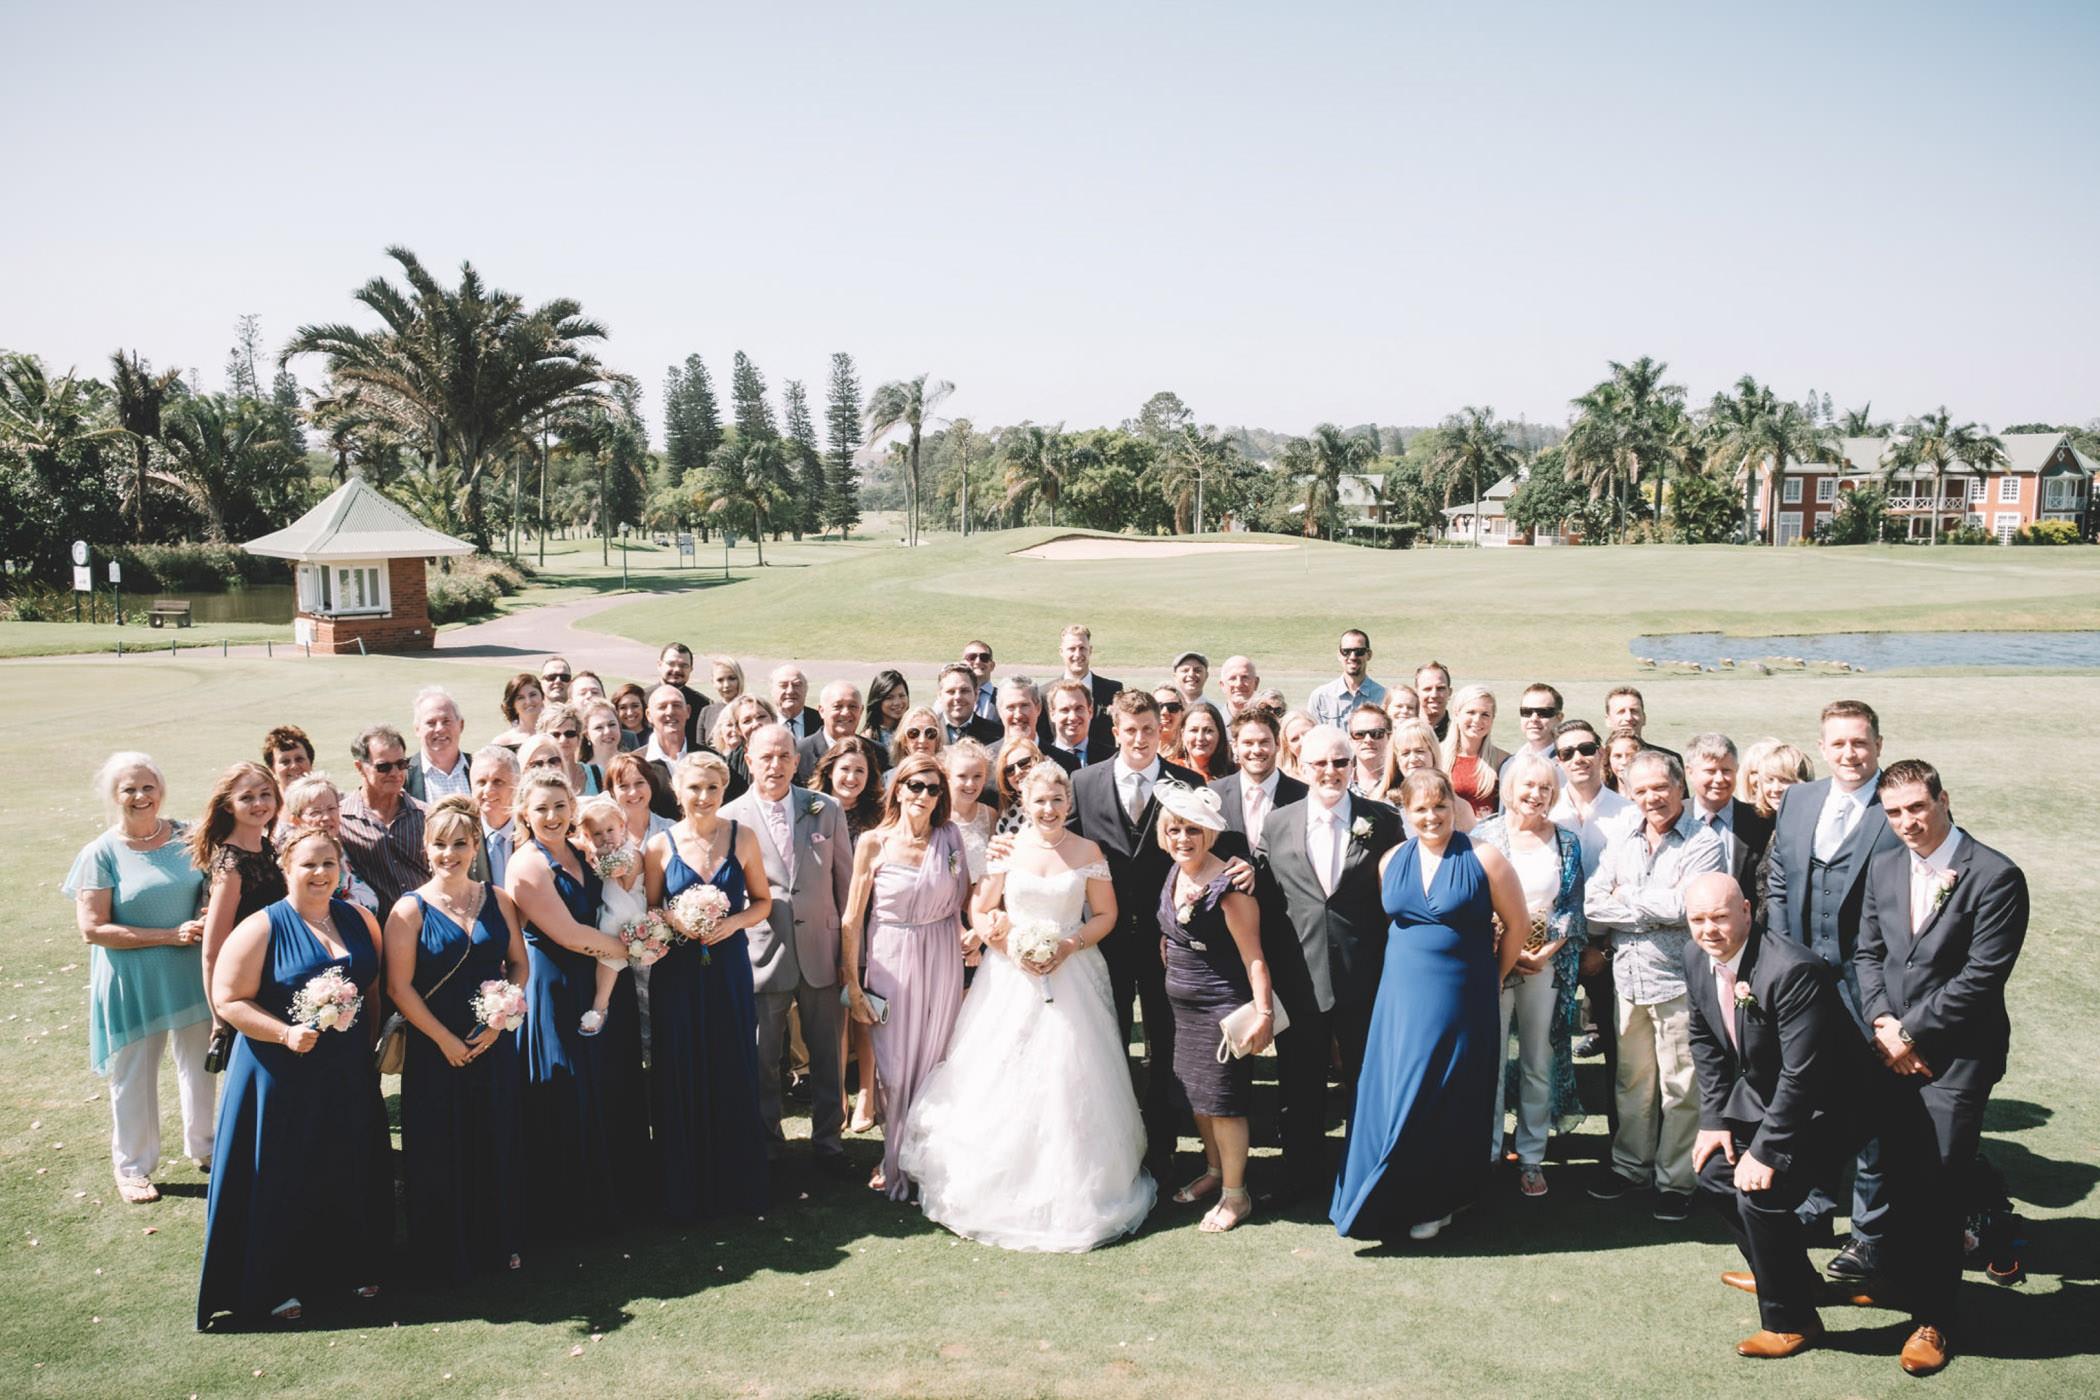 Mount Edgecombe Wedding Photography RBadal golf course